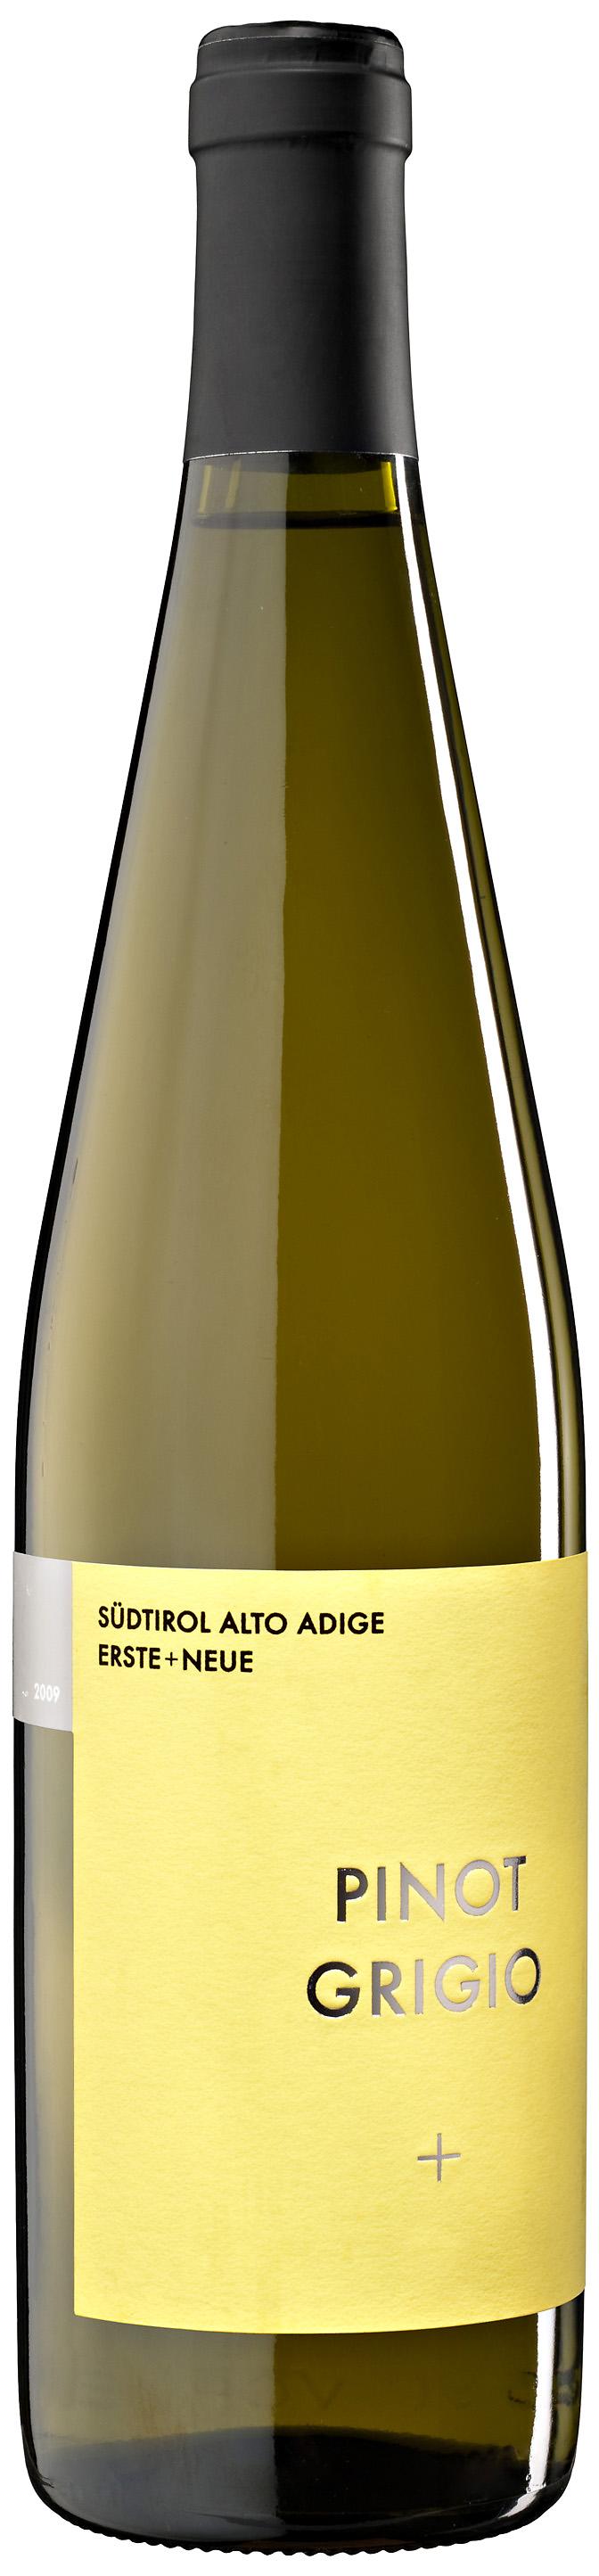 Pinot Grigio DOC 2010